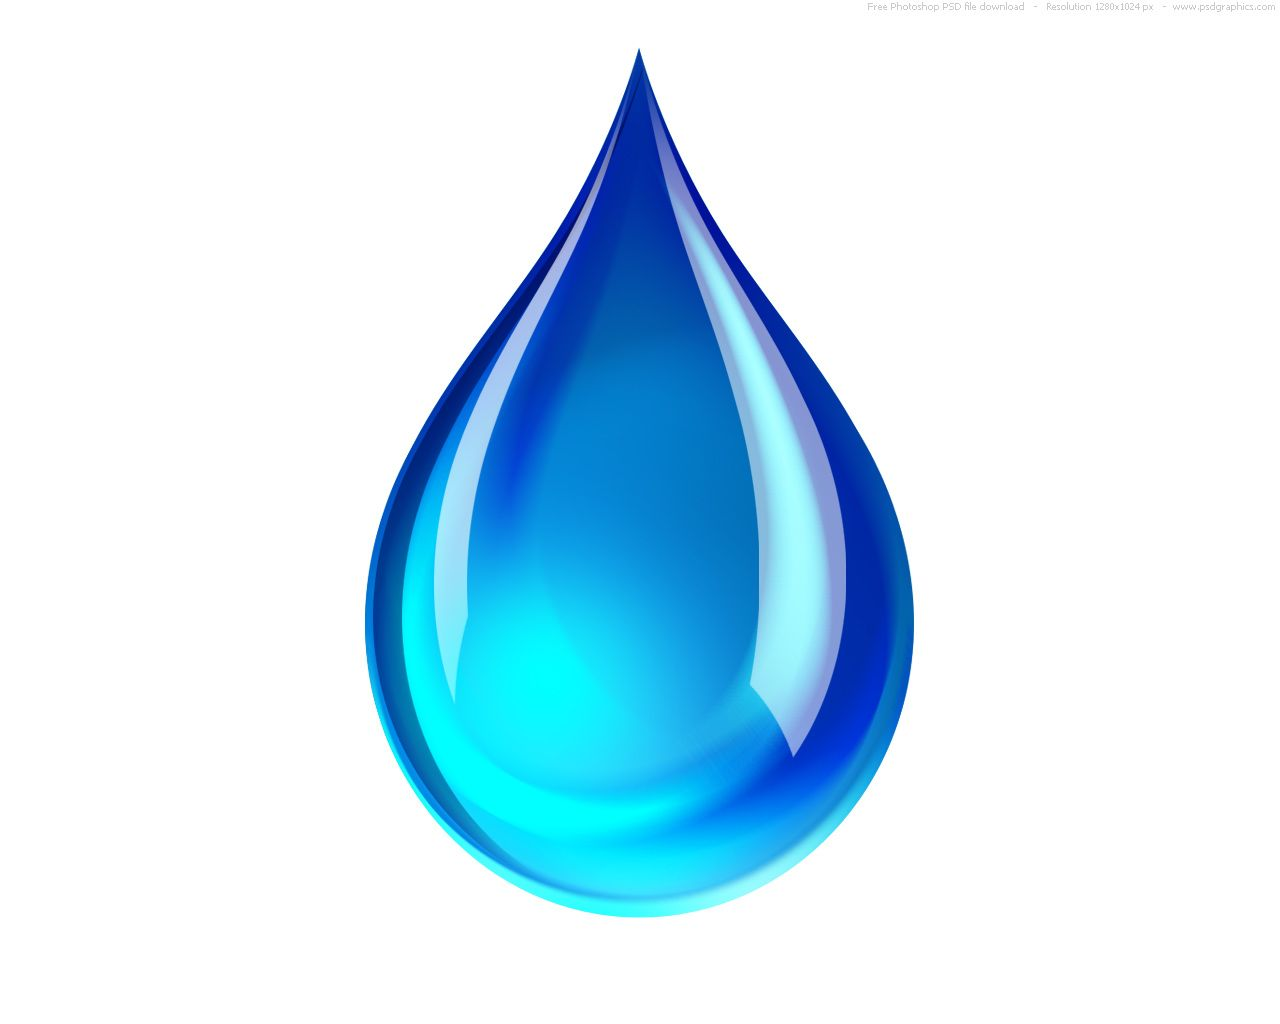 Water Drop Water Droplets Water Drops Droplets